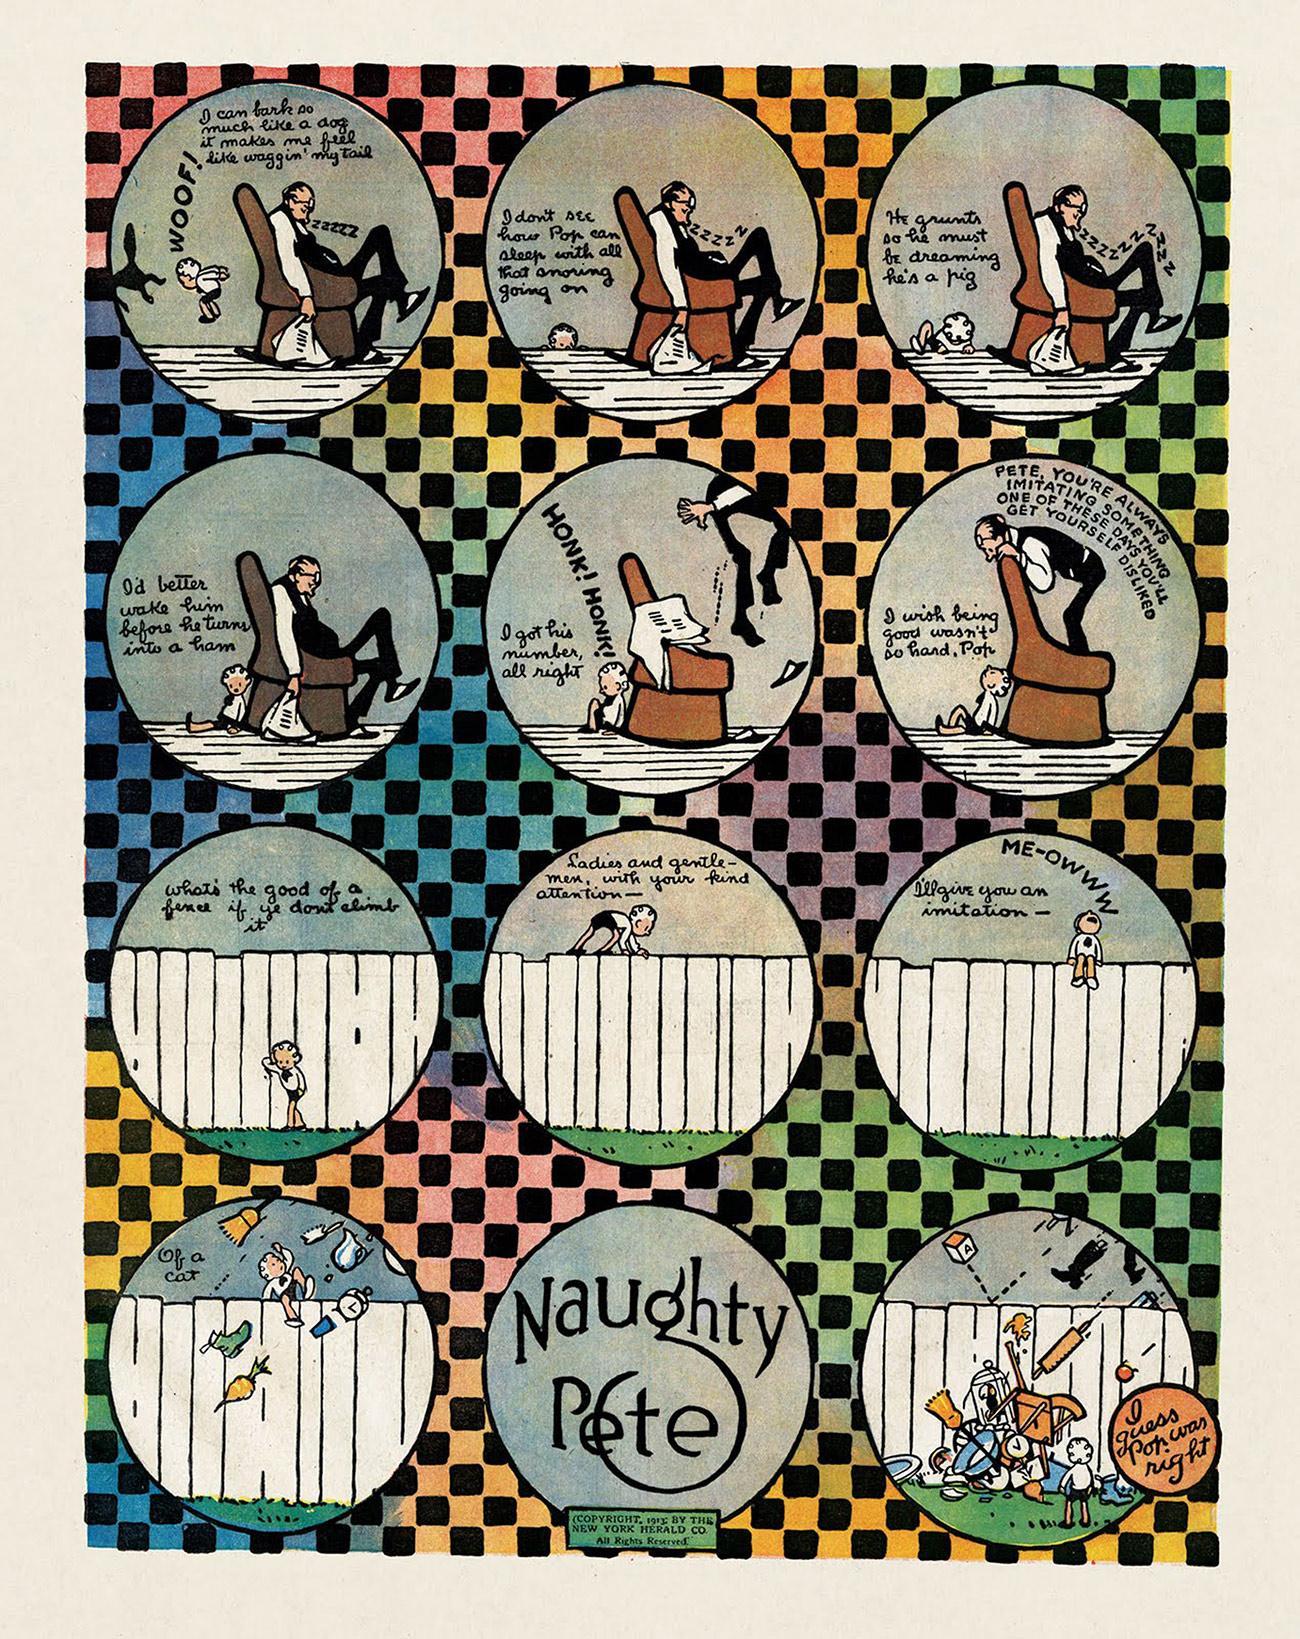 Schirn_Presse_Comic_Forbell_Naughty_Pete_19_10_1913